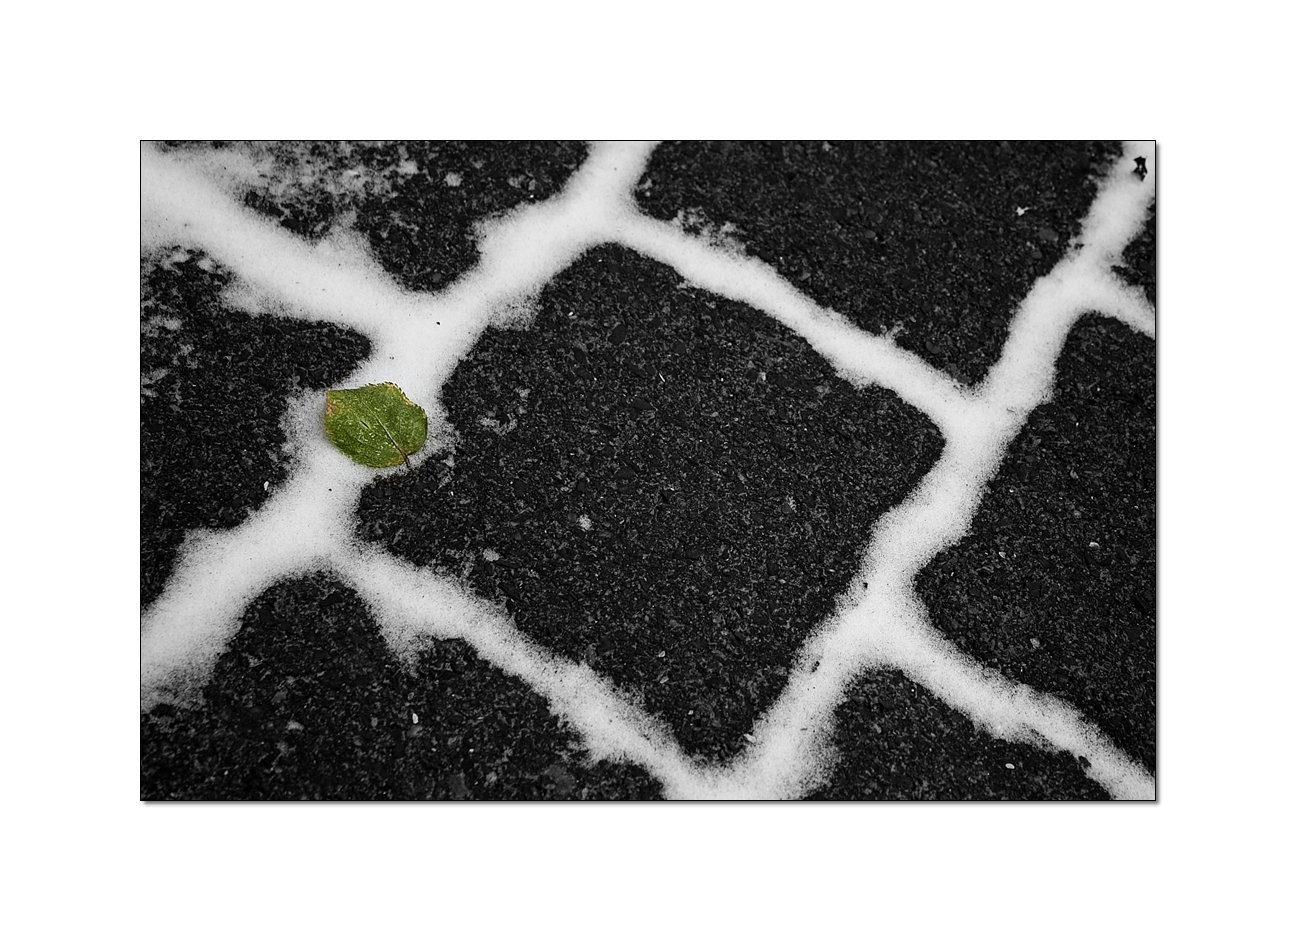 only a leaf.....